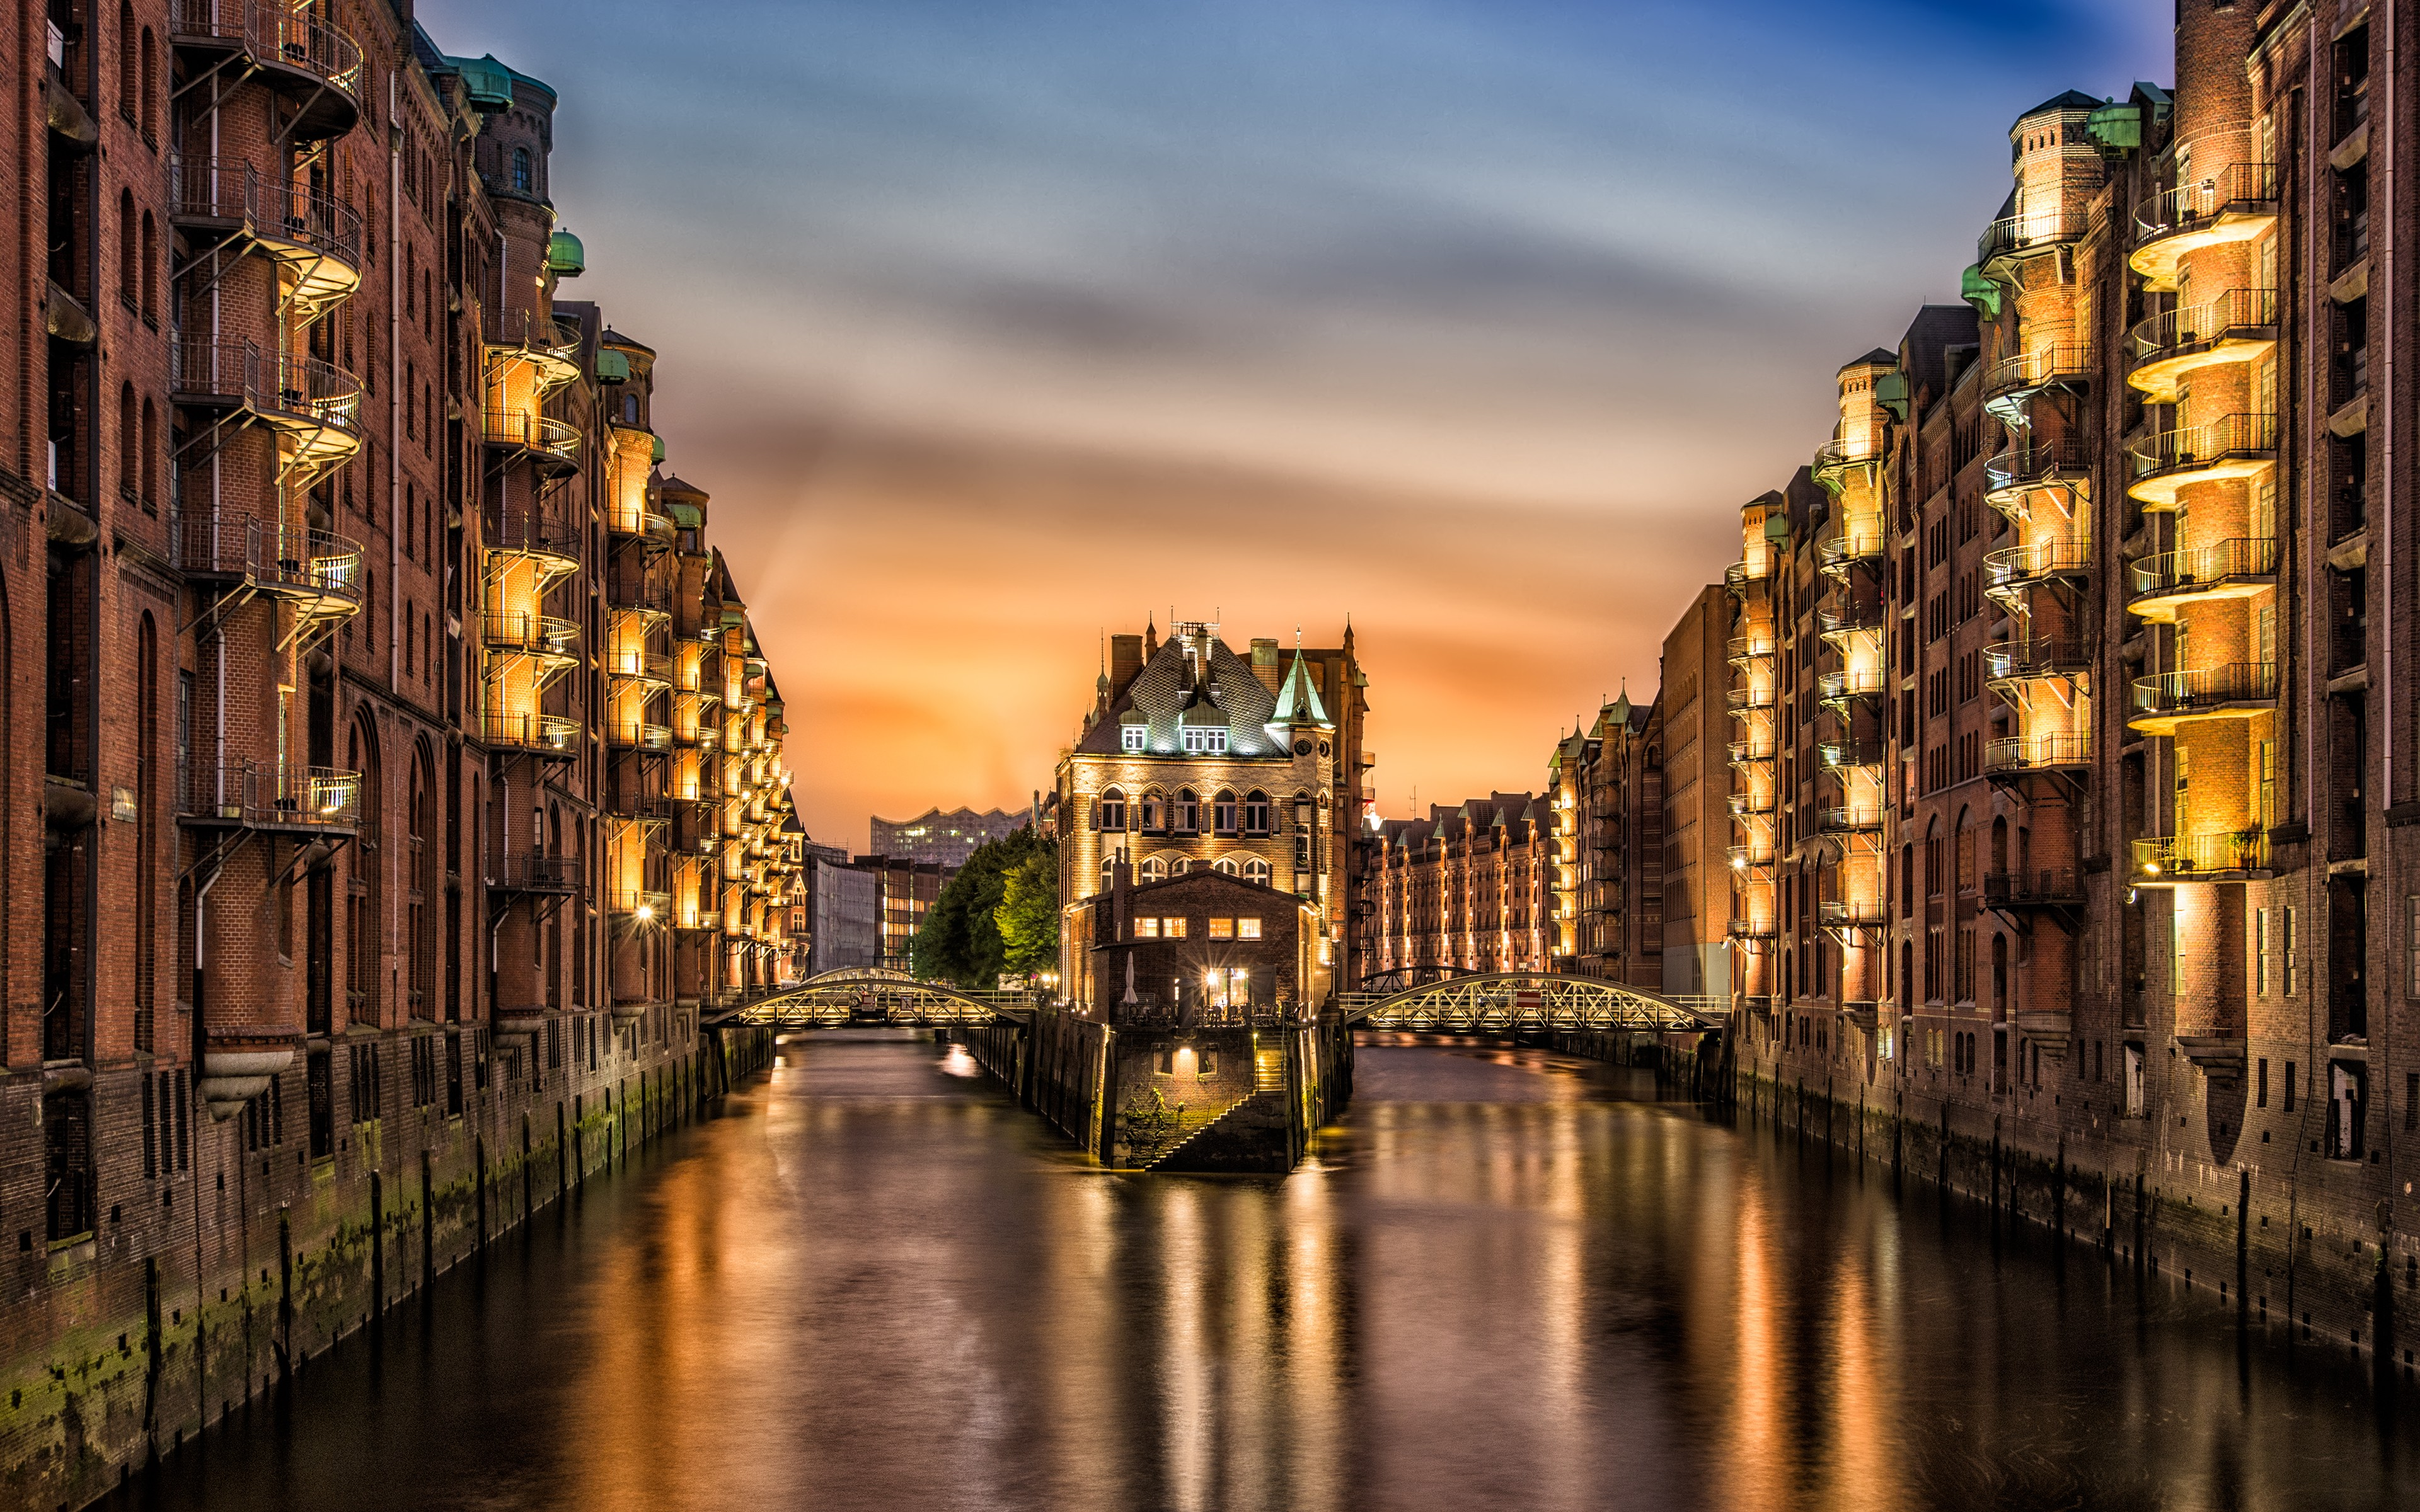 Giraffe Iphone Wallpaper Wallpaper Hamburg Germany Travel Tourism Architecture